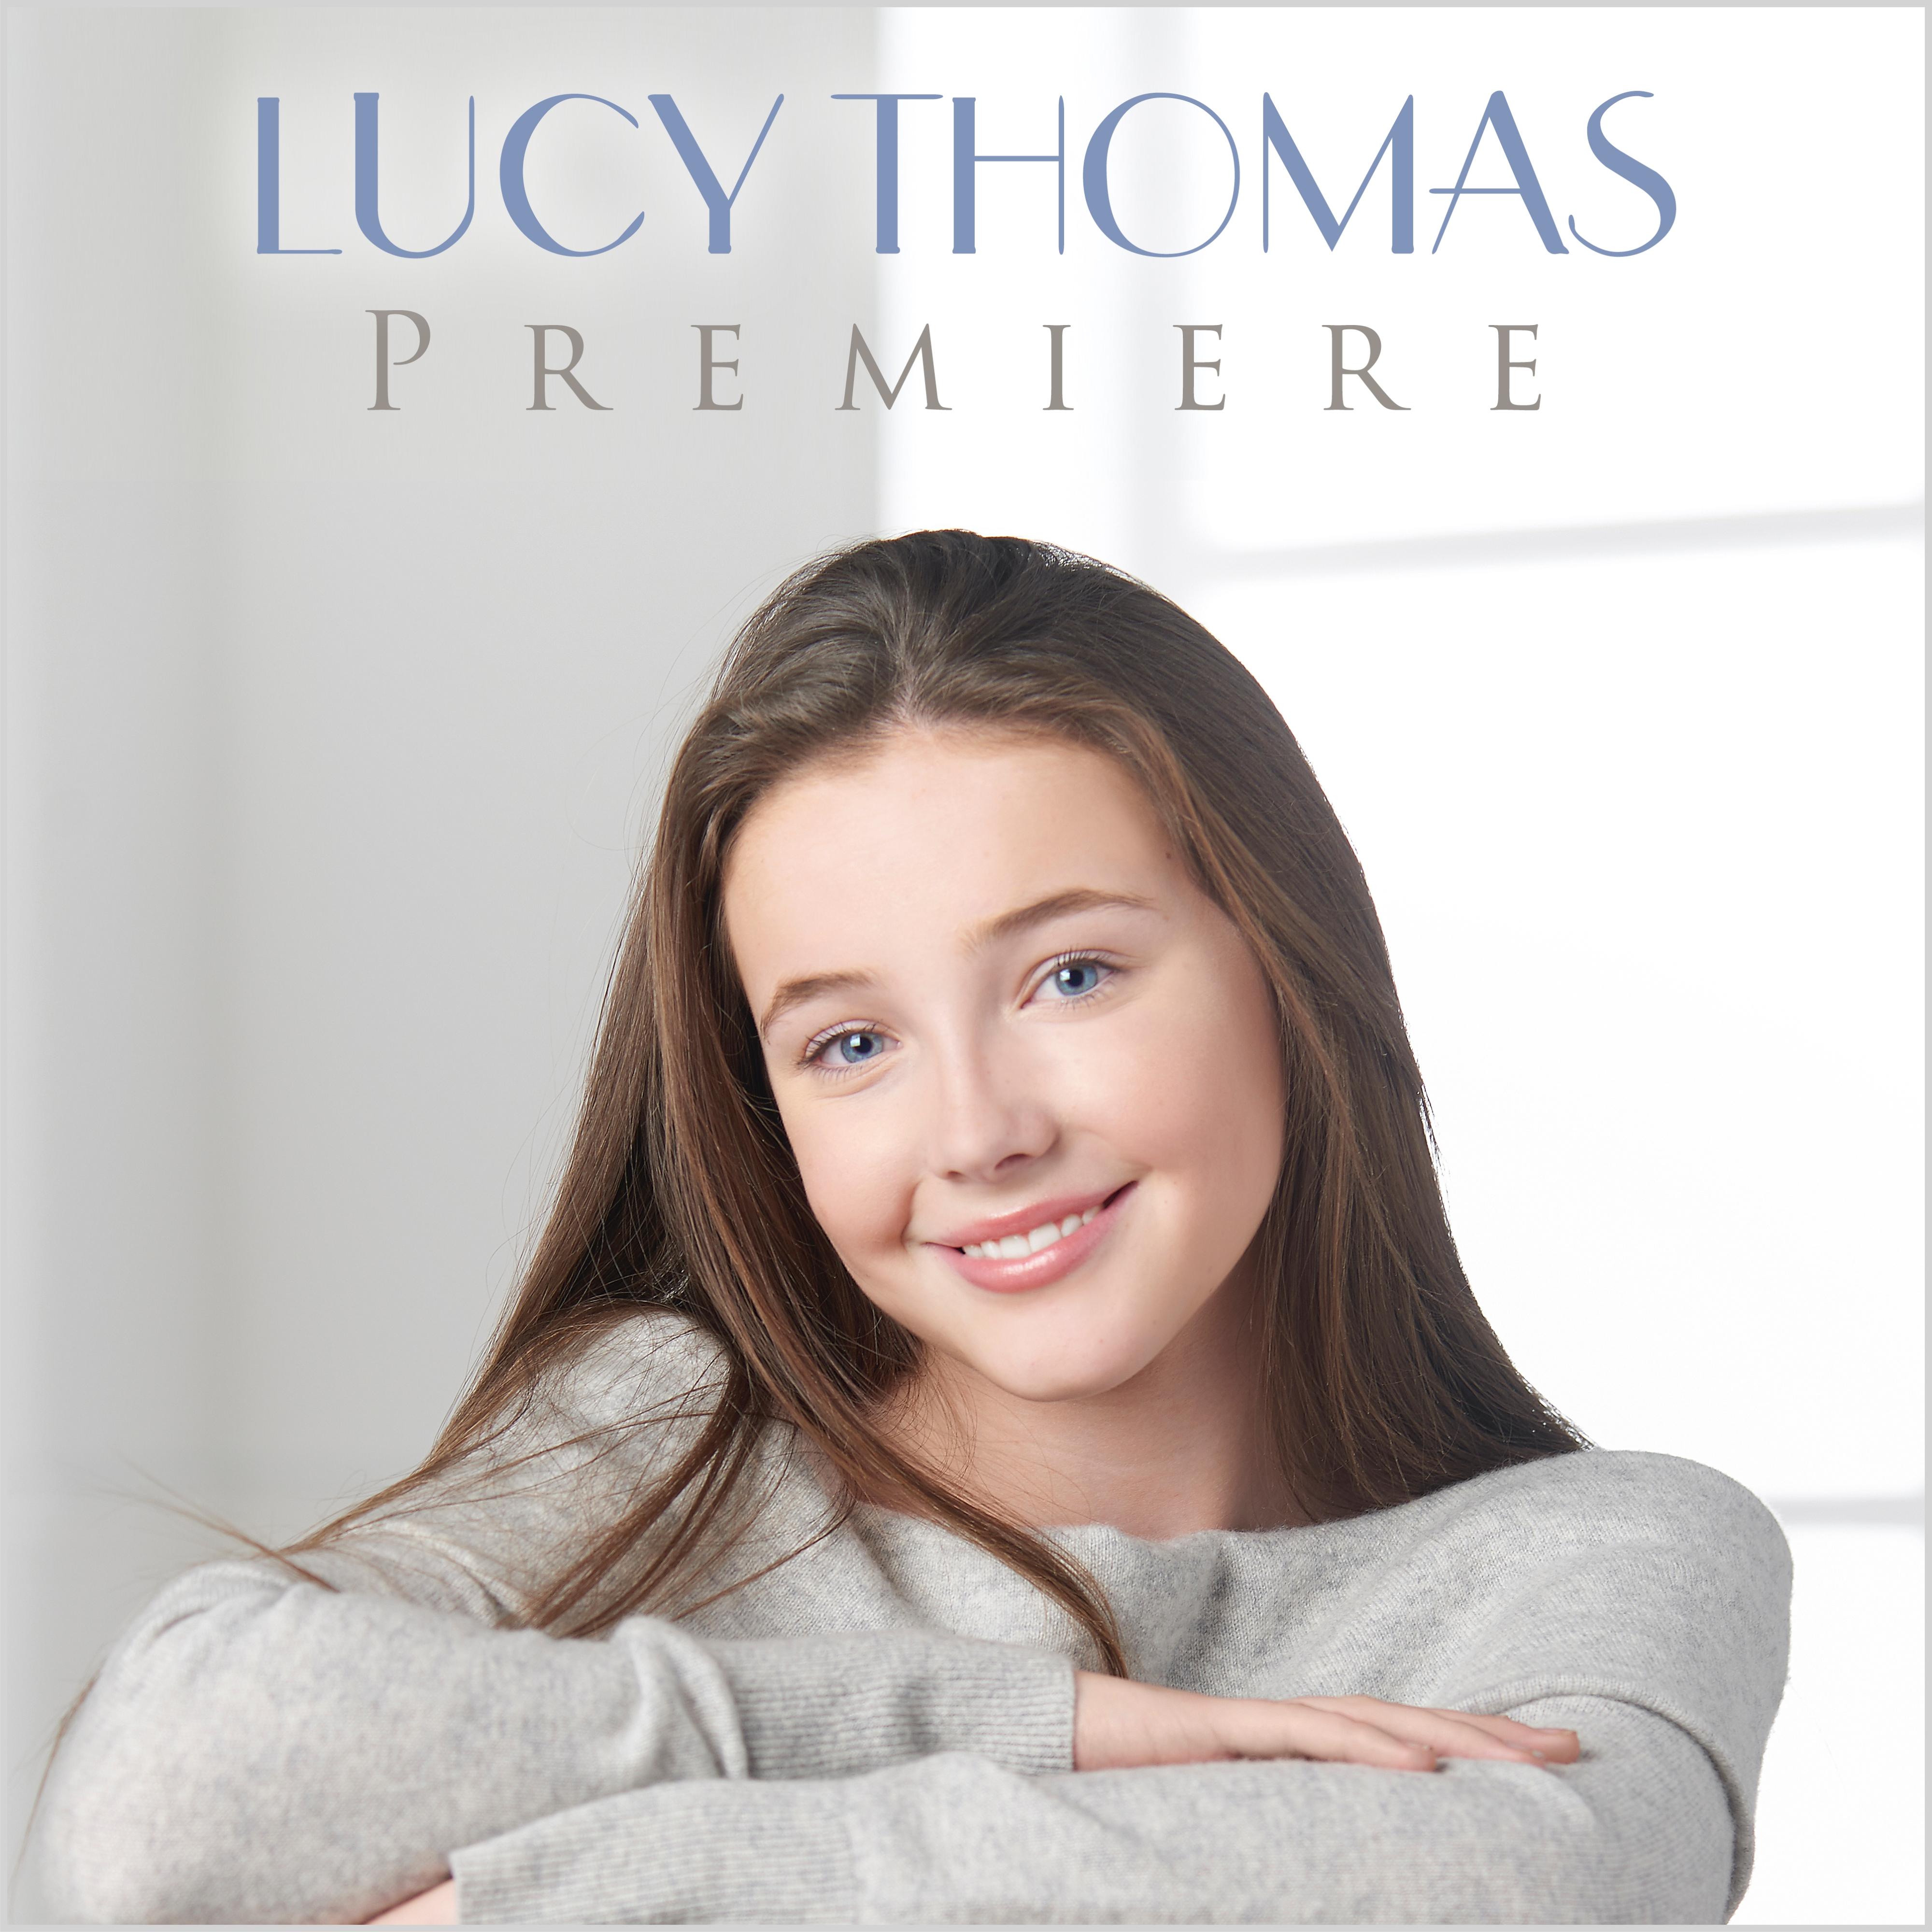 Premiere (Digital Download) - Lucy Thomas